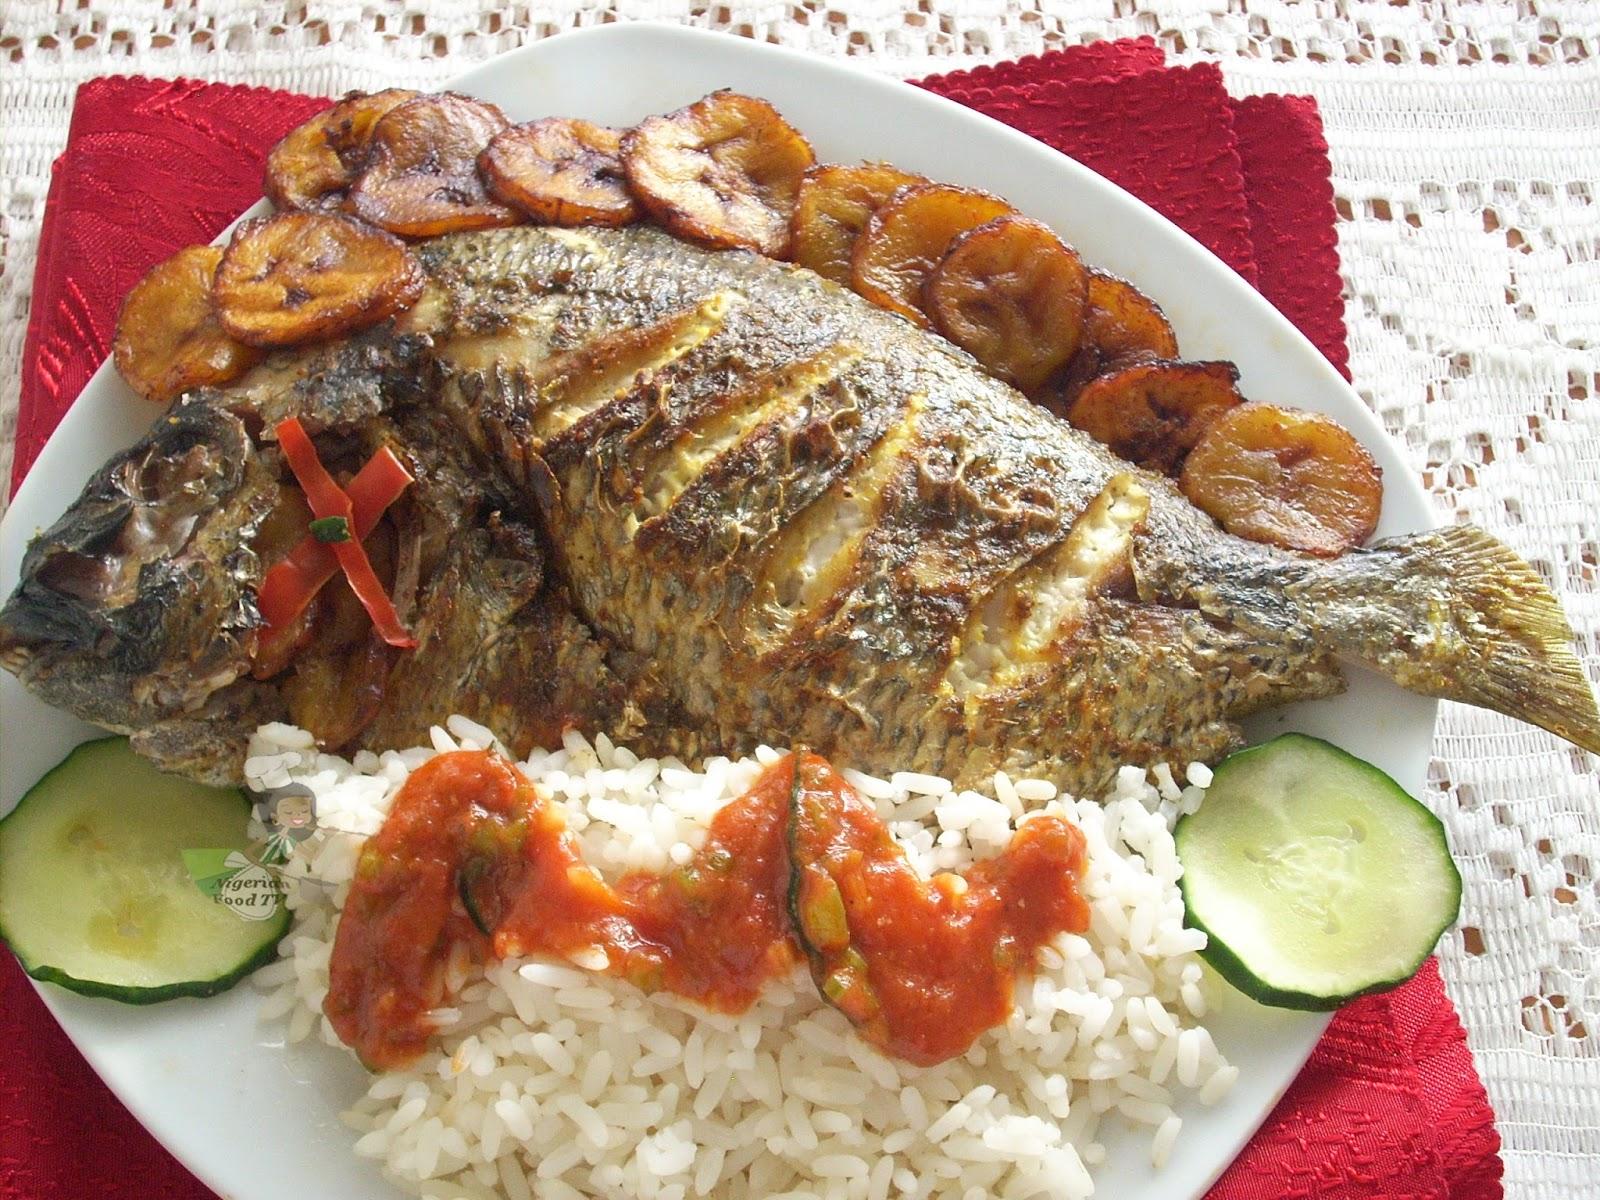 Nigerian Grilled Fish Recipe, Nigerian Food Recipes, Nigerian Food Recipes, Nigerian Recipes, Nigerian Food, Nigerian Food TV